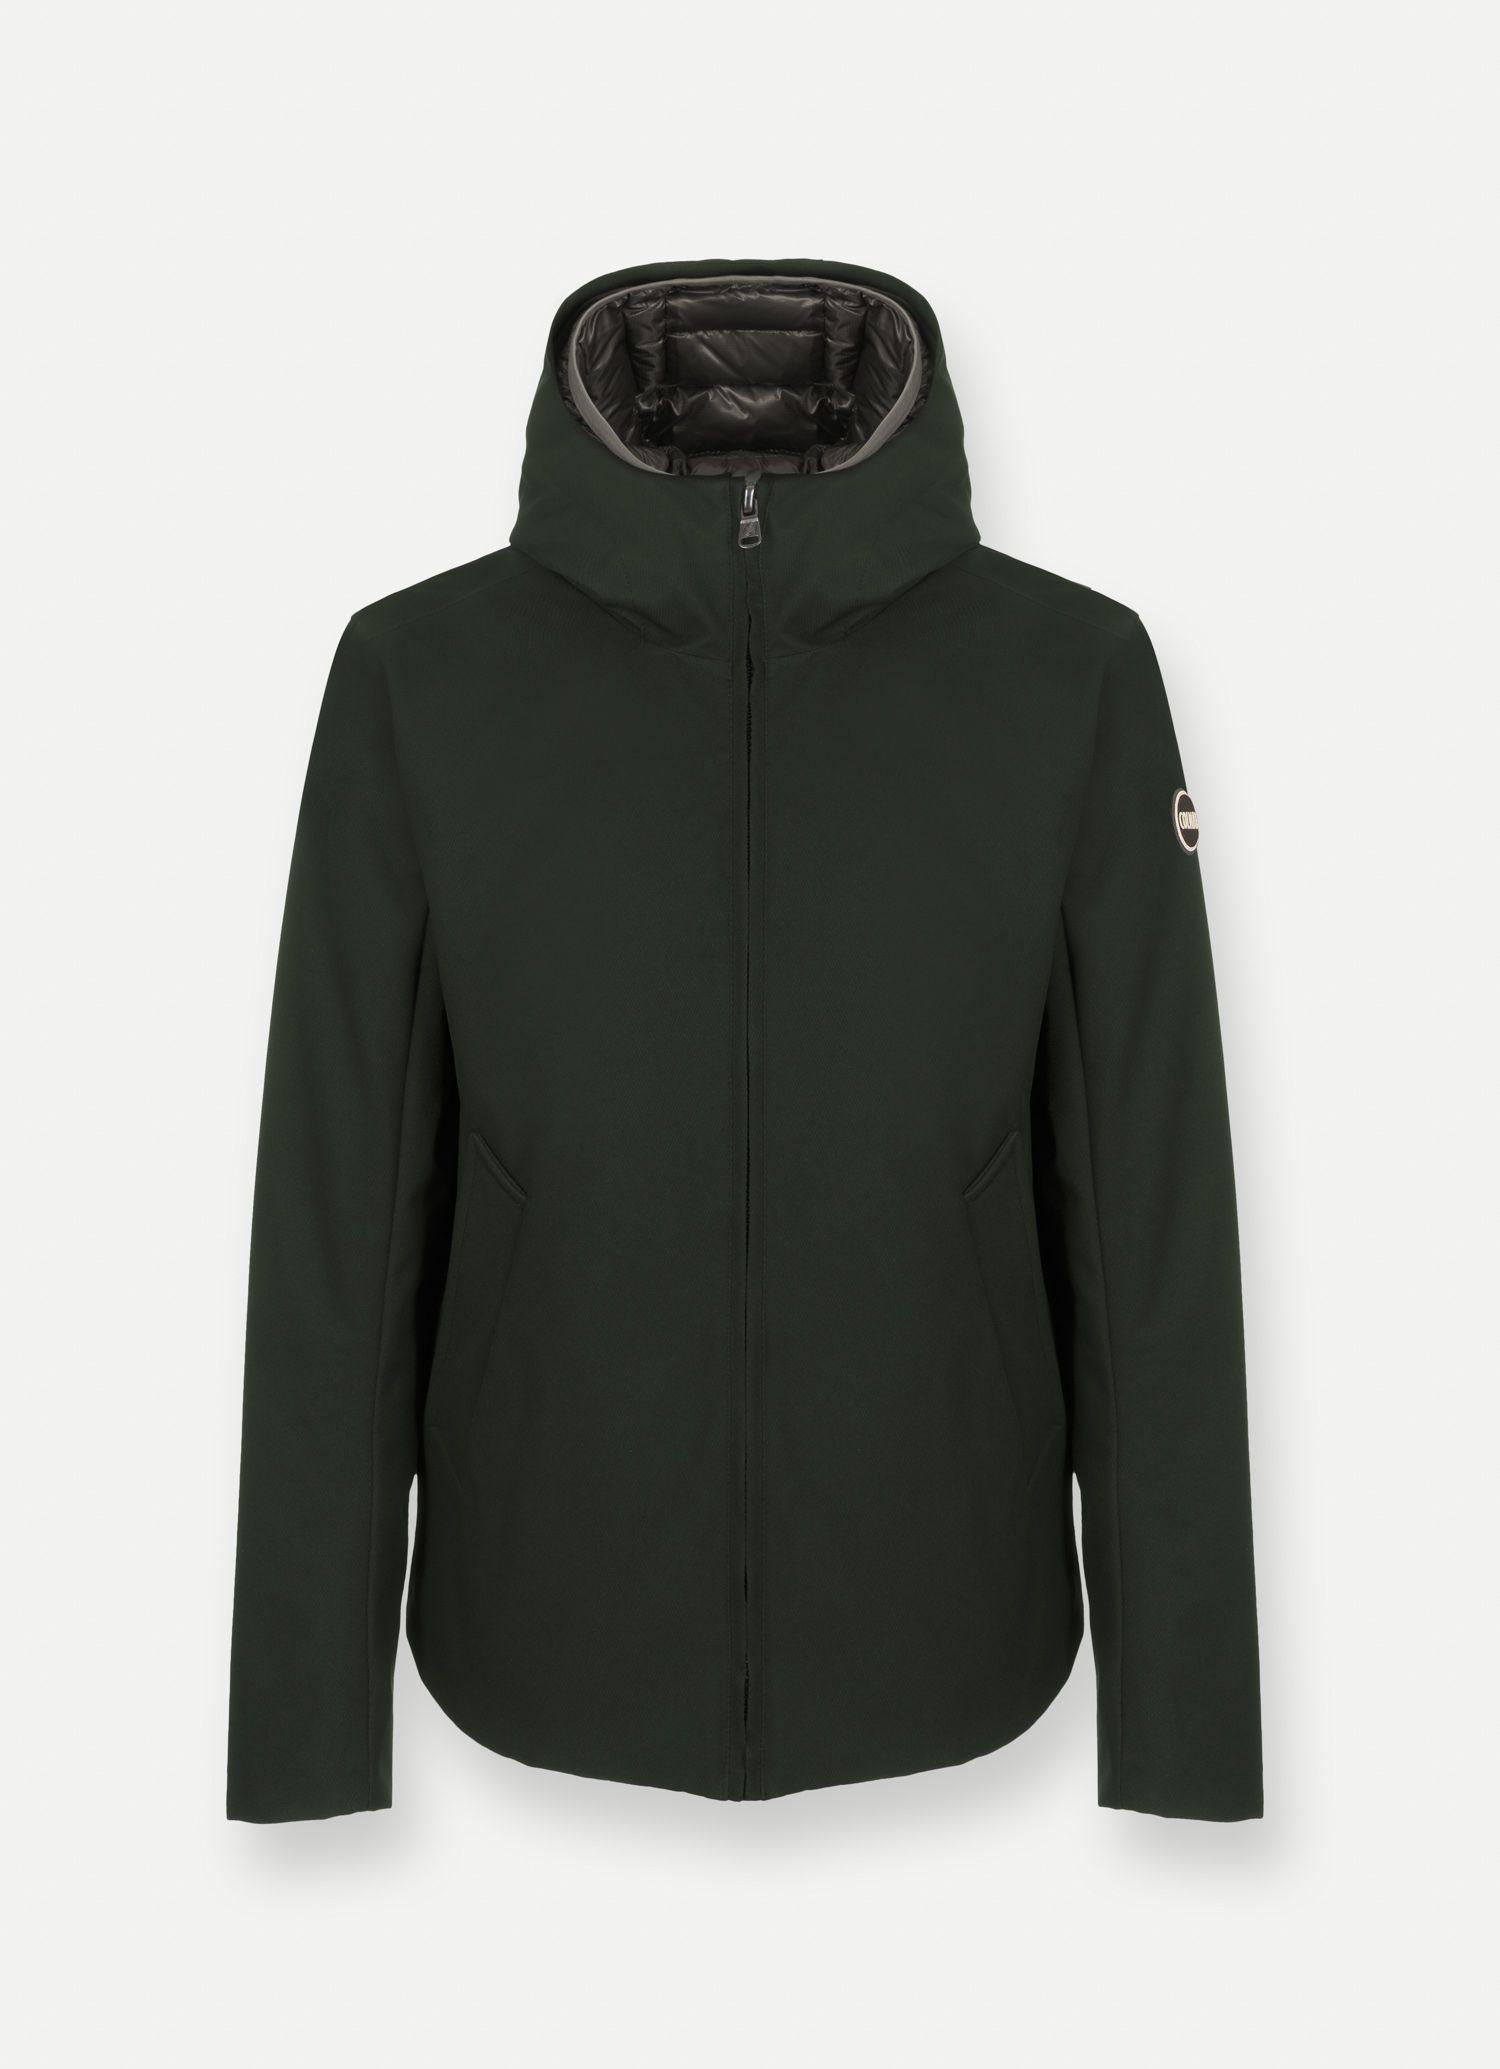 I 10 giacchetti invernali uomo imbottiti moda inverno 2020